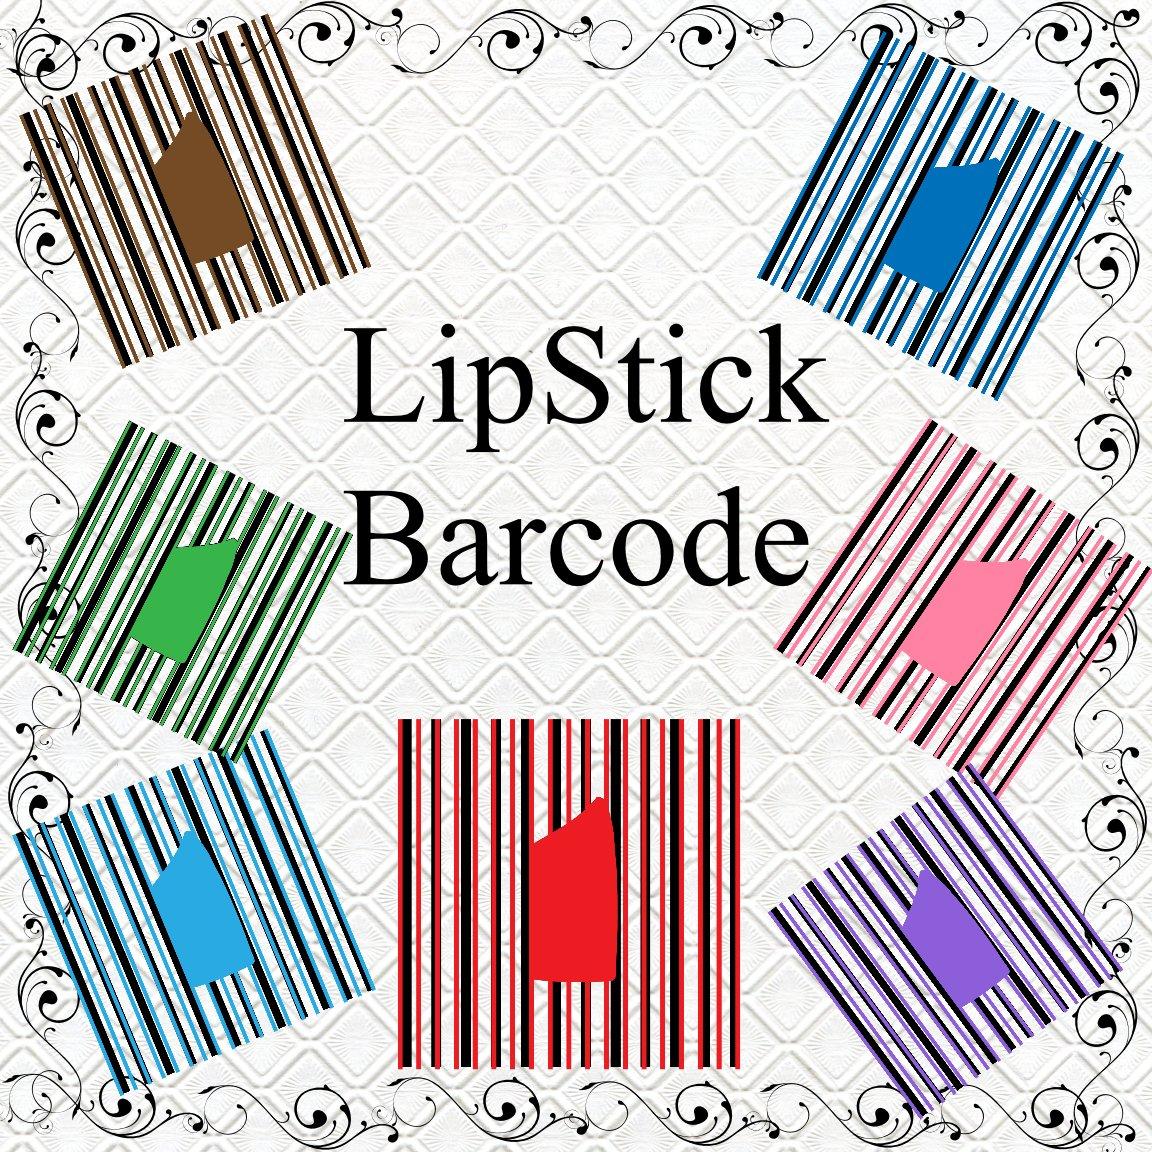 LipStick Barcode-Digital ClipArt-Art Clip-Gift Tag-Tshirt-Banner-Background-Gift Card.